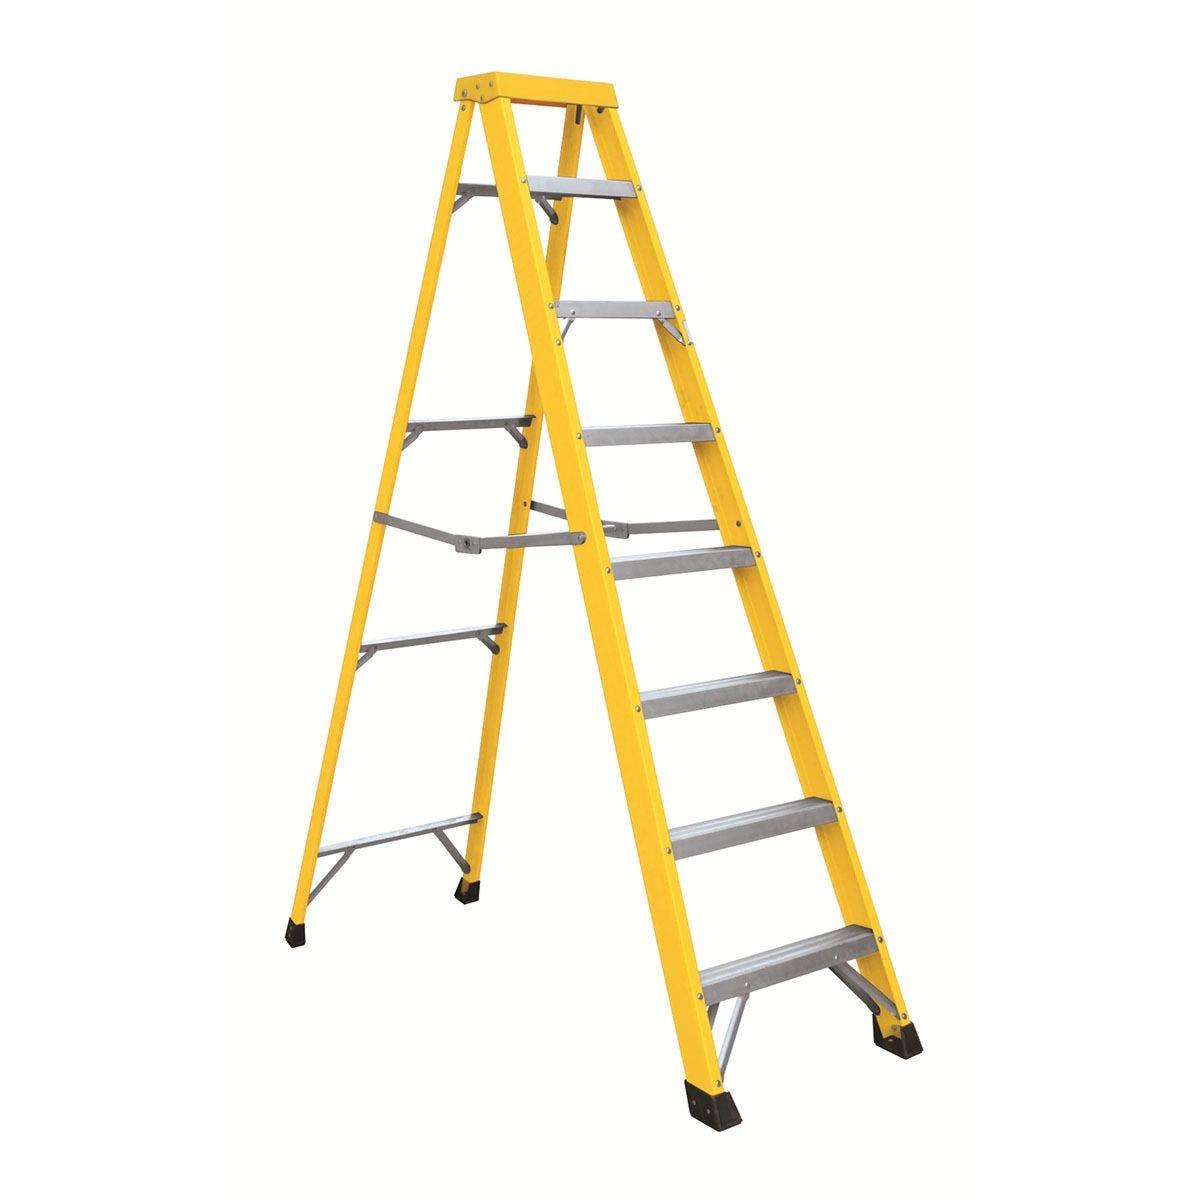 Draper Fibreglass 7 Step Ladder - Yellow